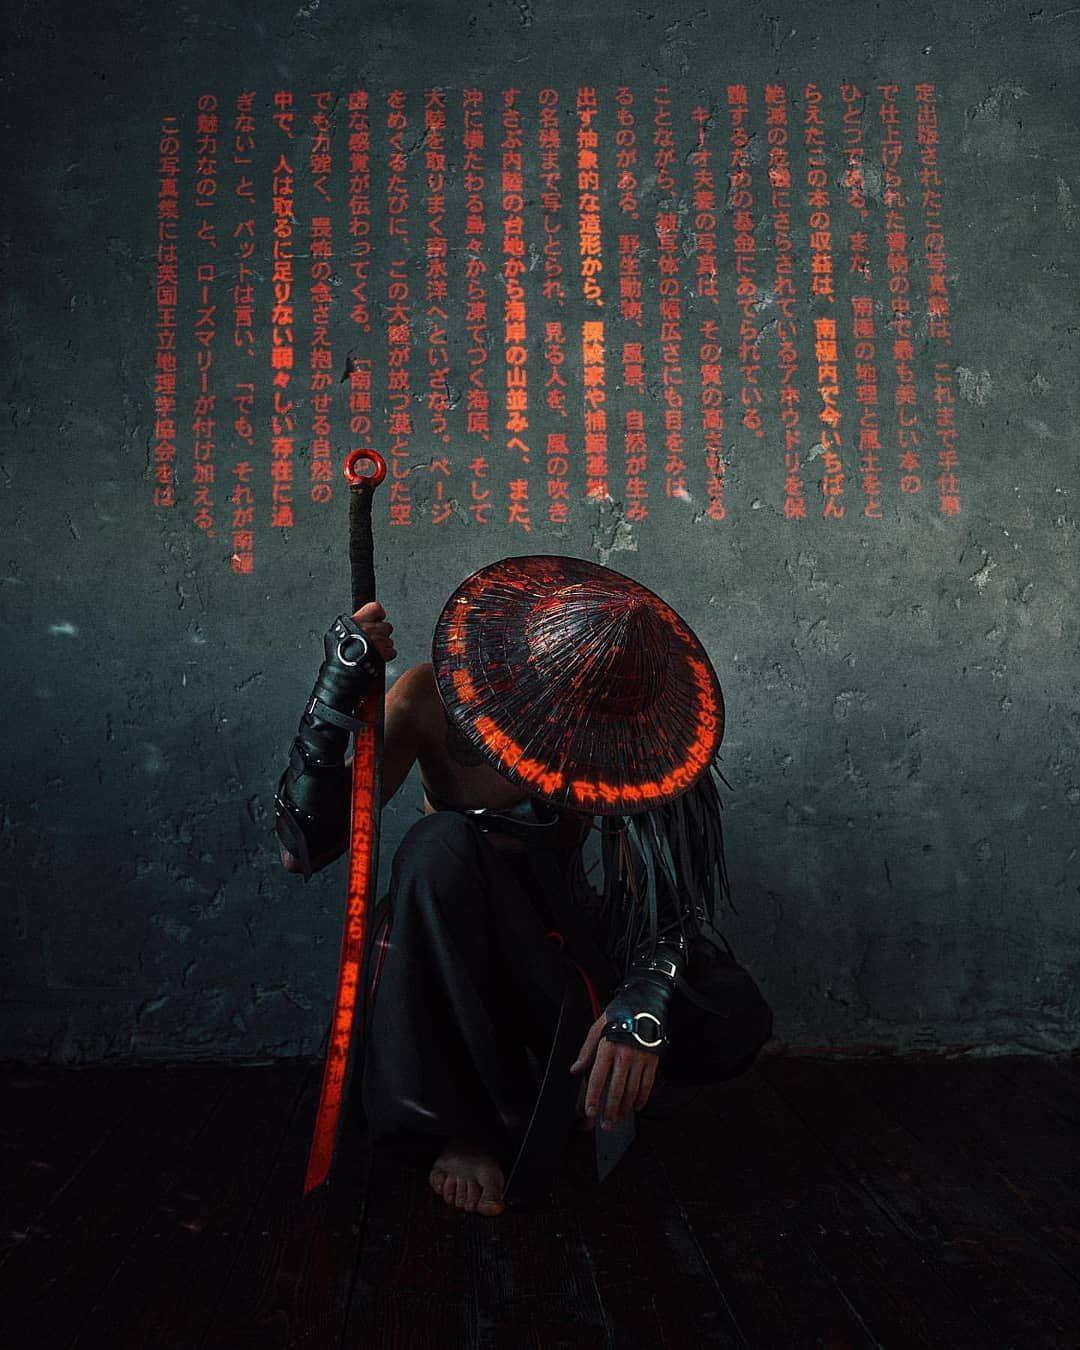 E M P I R E O F F U T U R E On Instagram Rate Work From 1 To 10 Photo By Melnukoff Model Alekseyfly Costume C Samurai Art Ninja Art Samurai Wallpaper